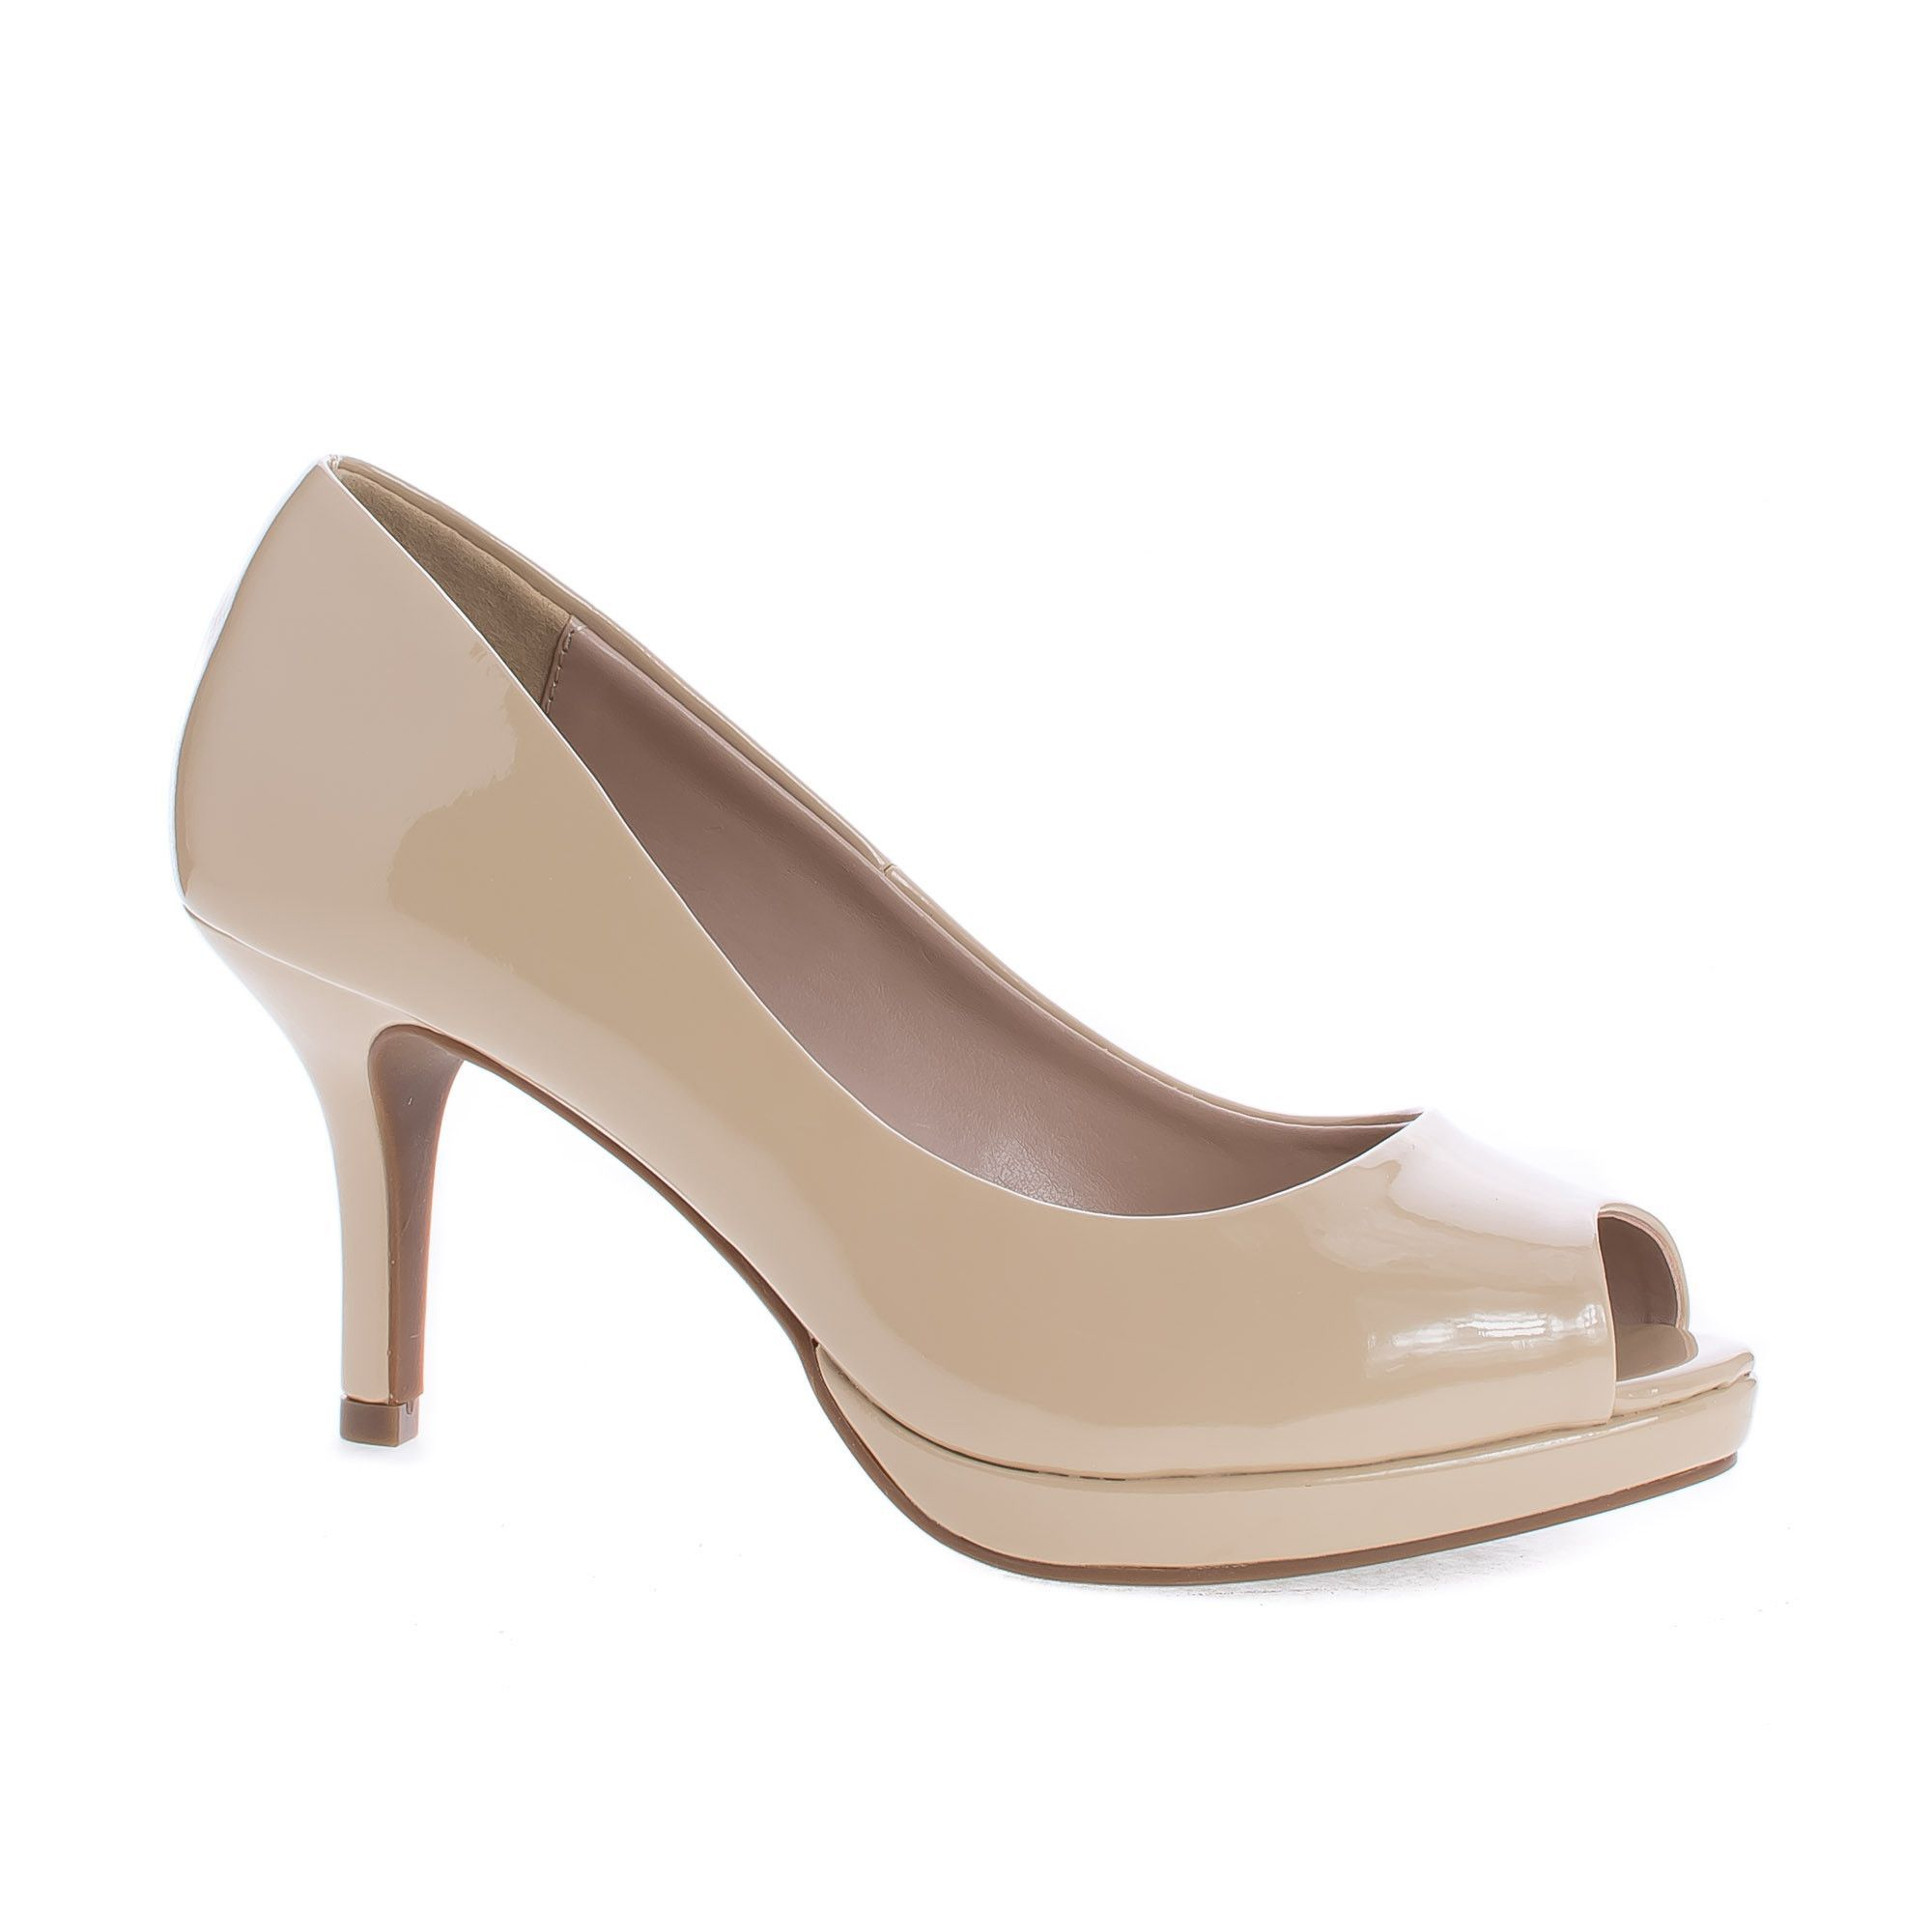 Walter Dark Beige Patent Peep Toe Extra Comfort Insole Stiletto Heel Classic Dress Pumps